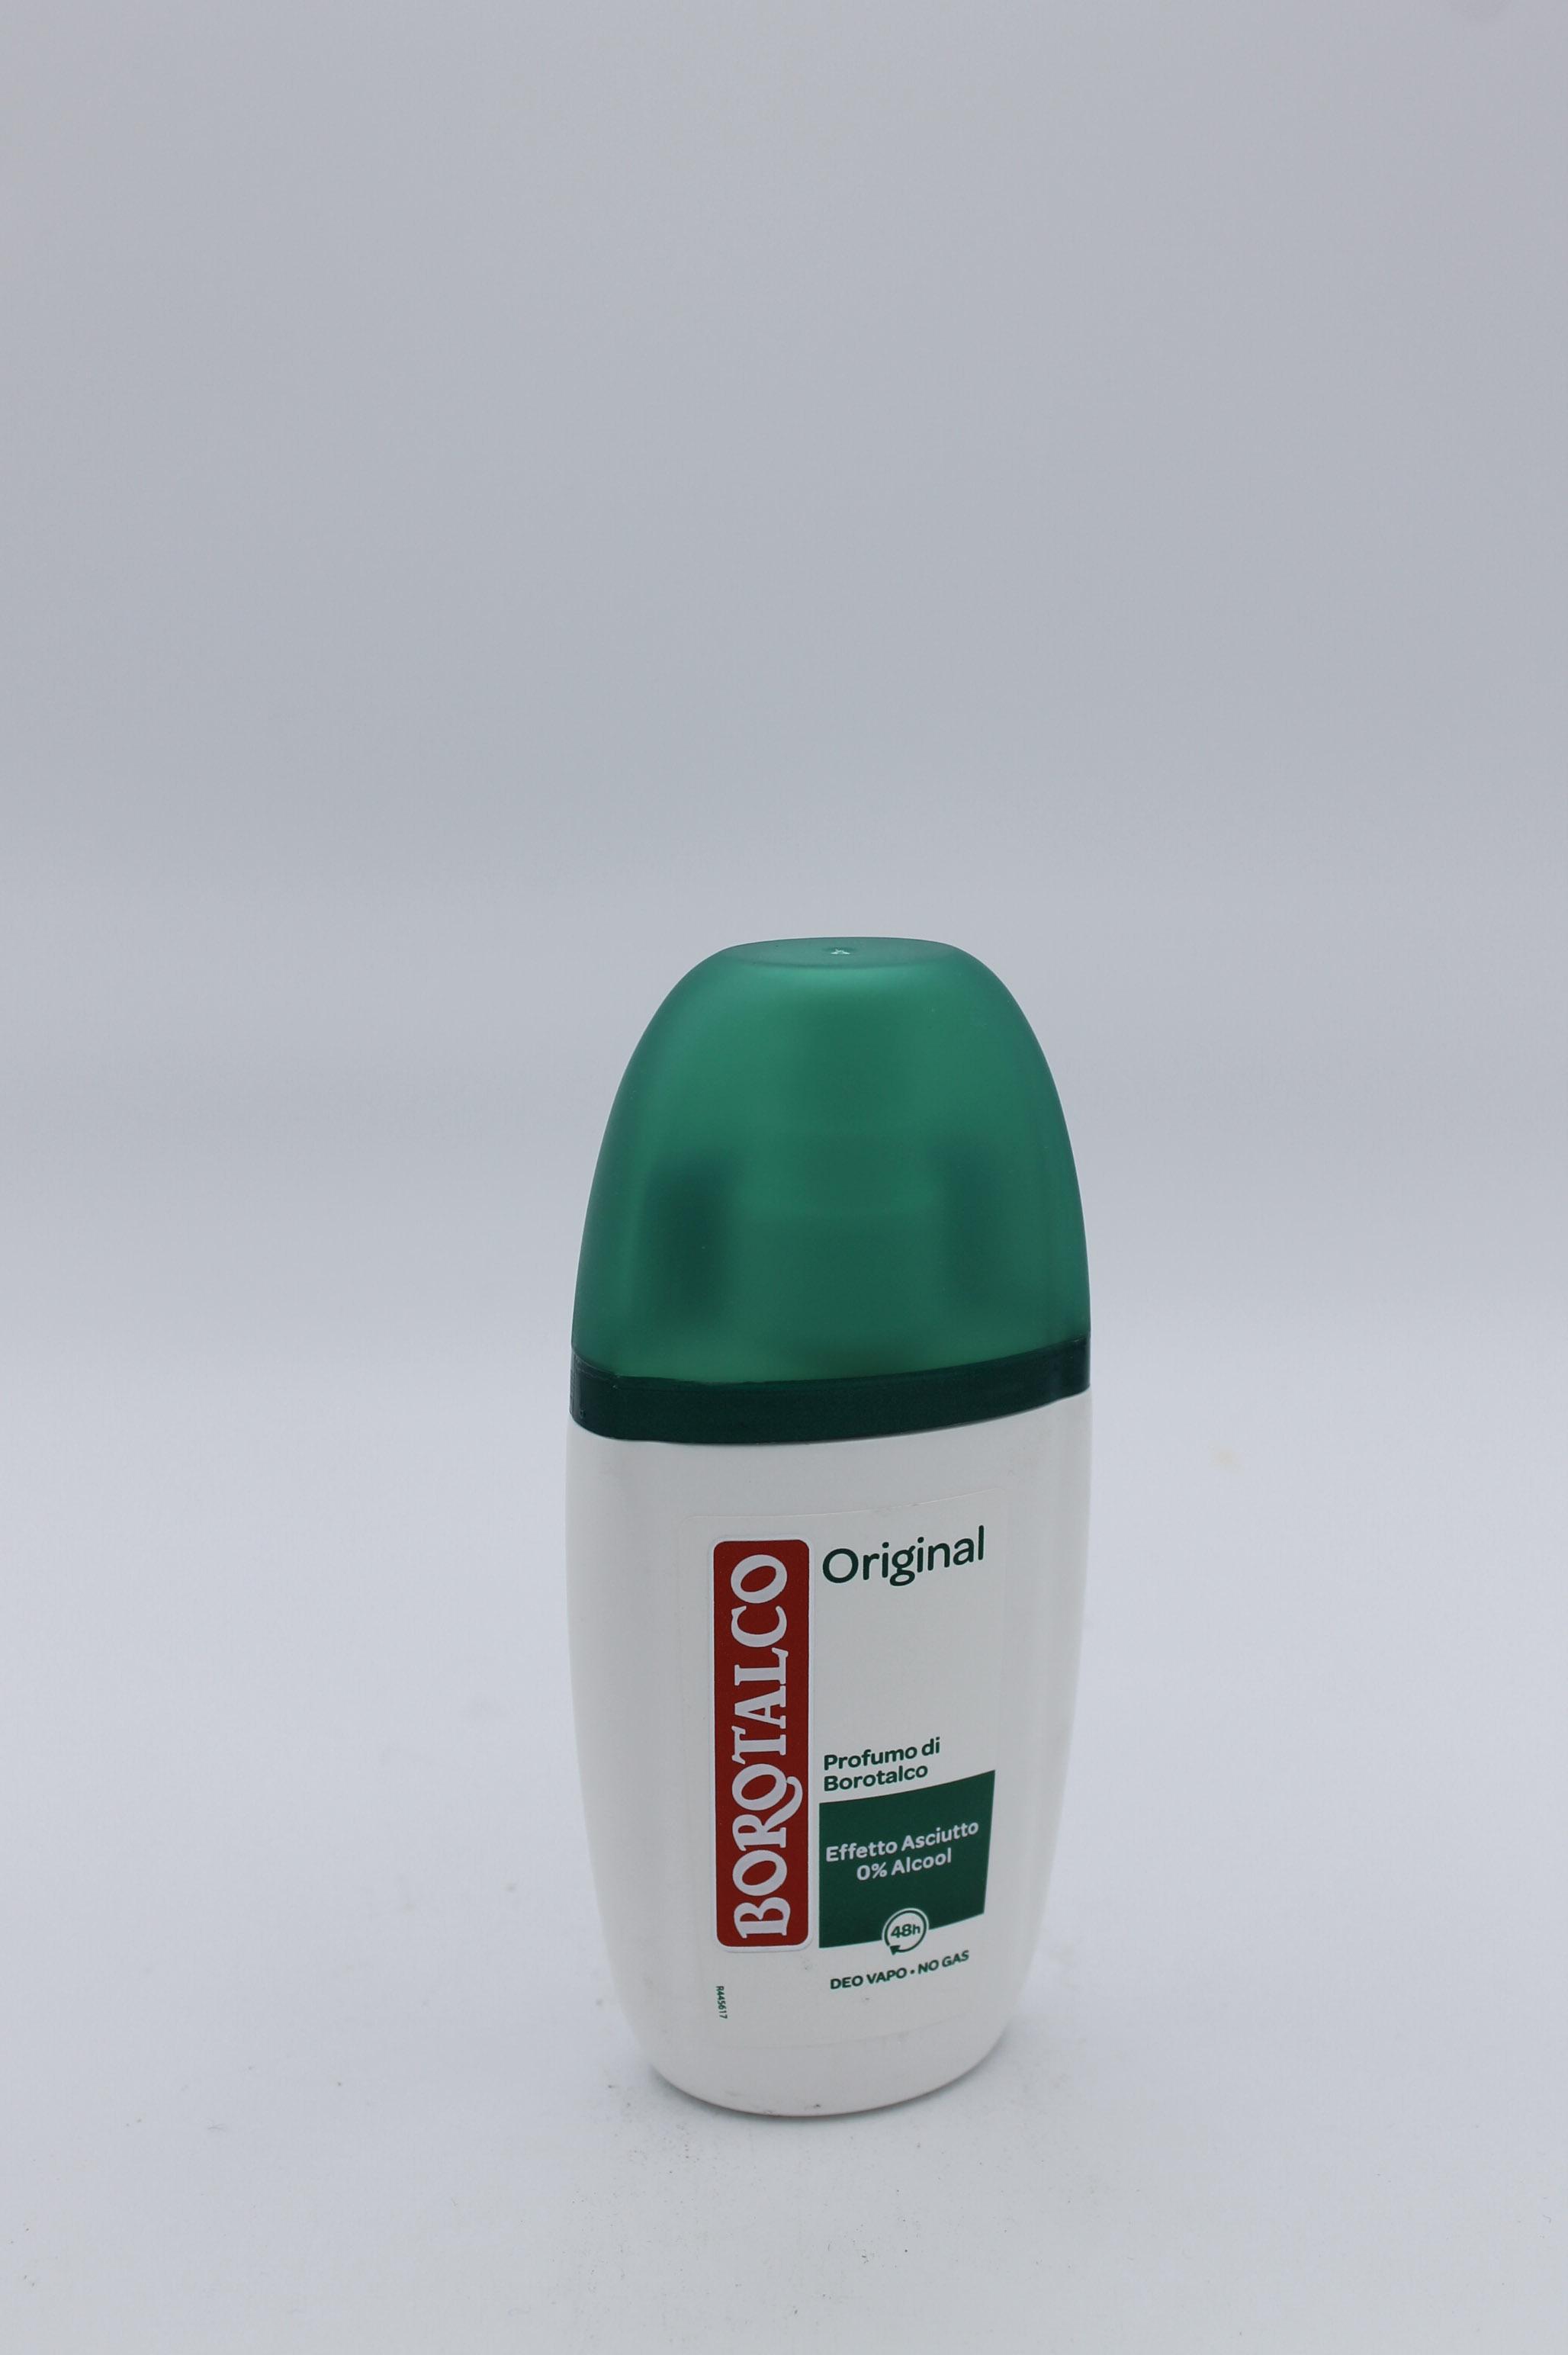 Borotalco deodorante vapo original 75ml.